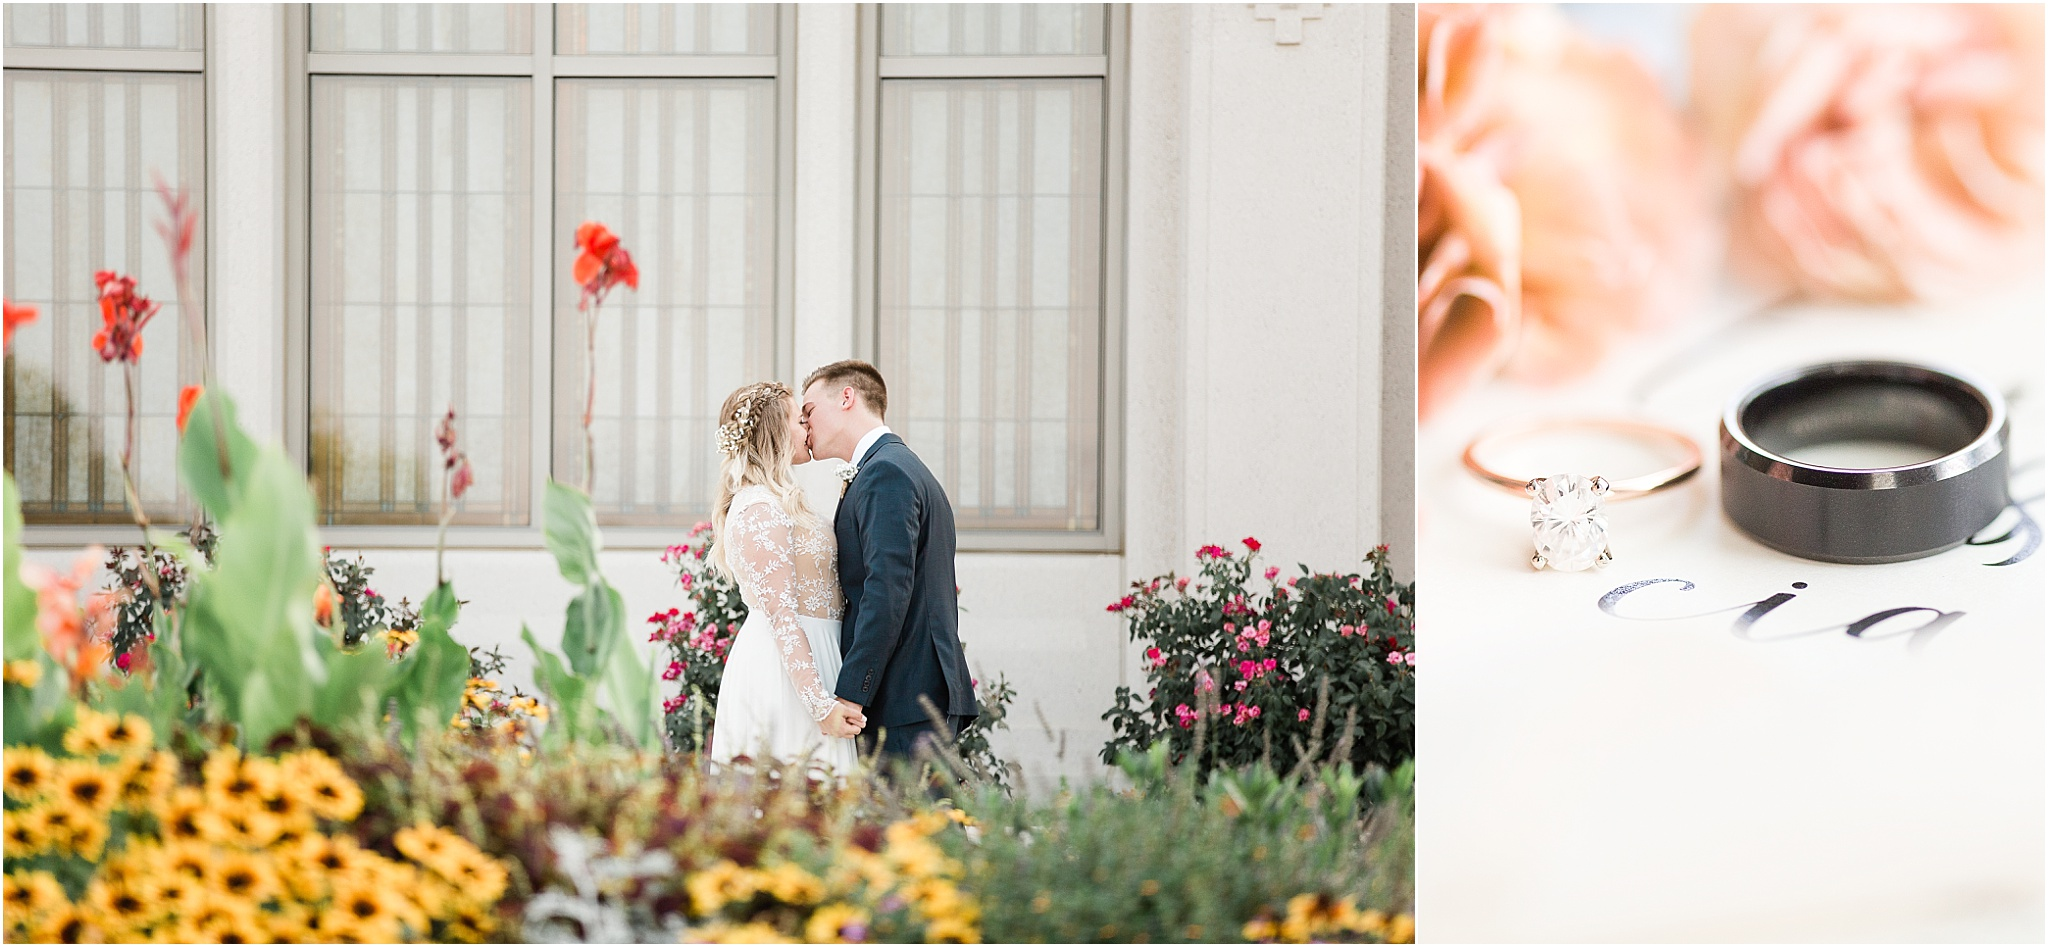 Wedding Photography_Meridian Idaho Temple_Boise Idaho_Nampa Idaho_Leah Southwick Photography_0009.jpg